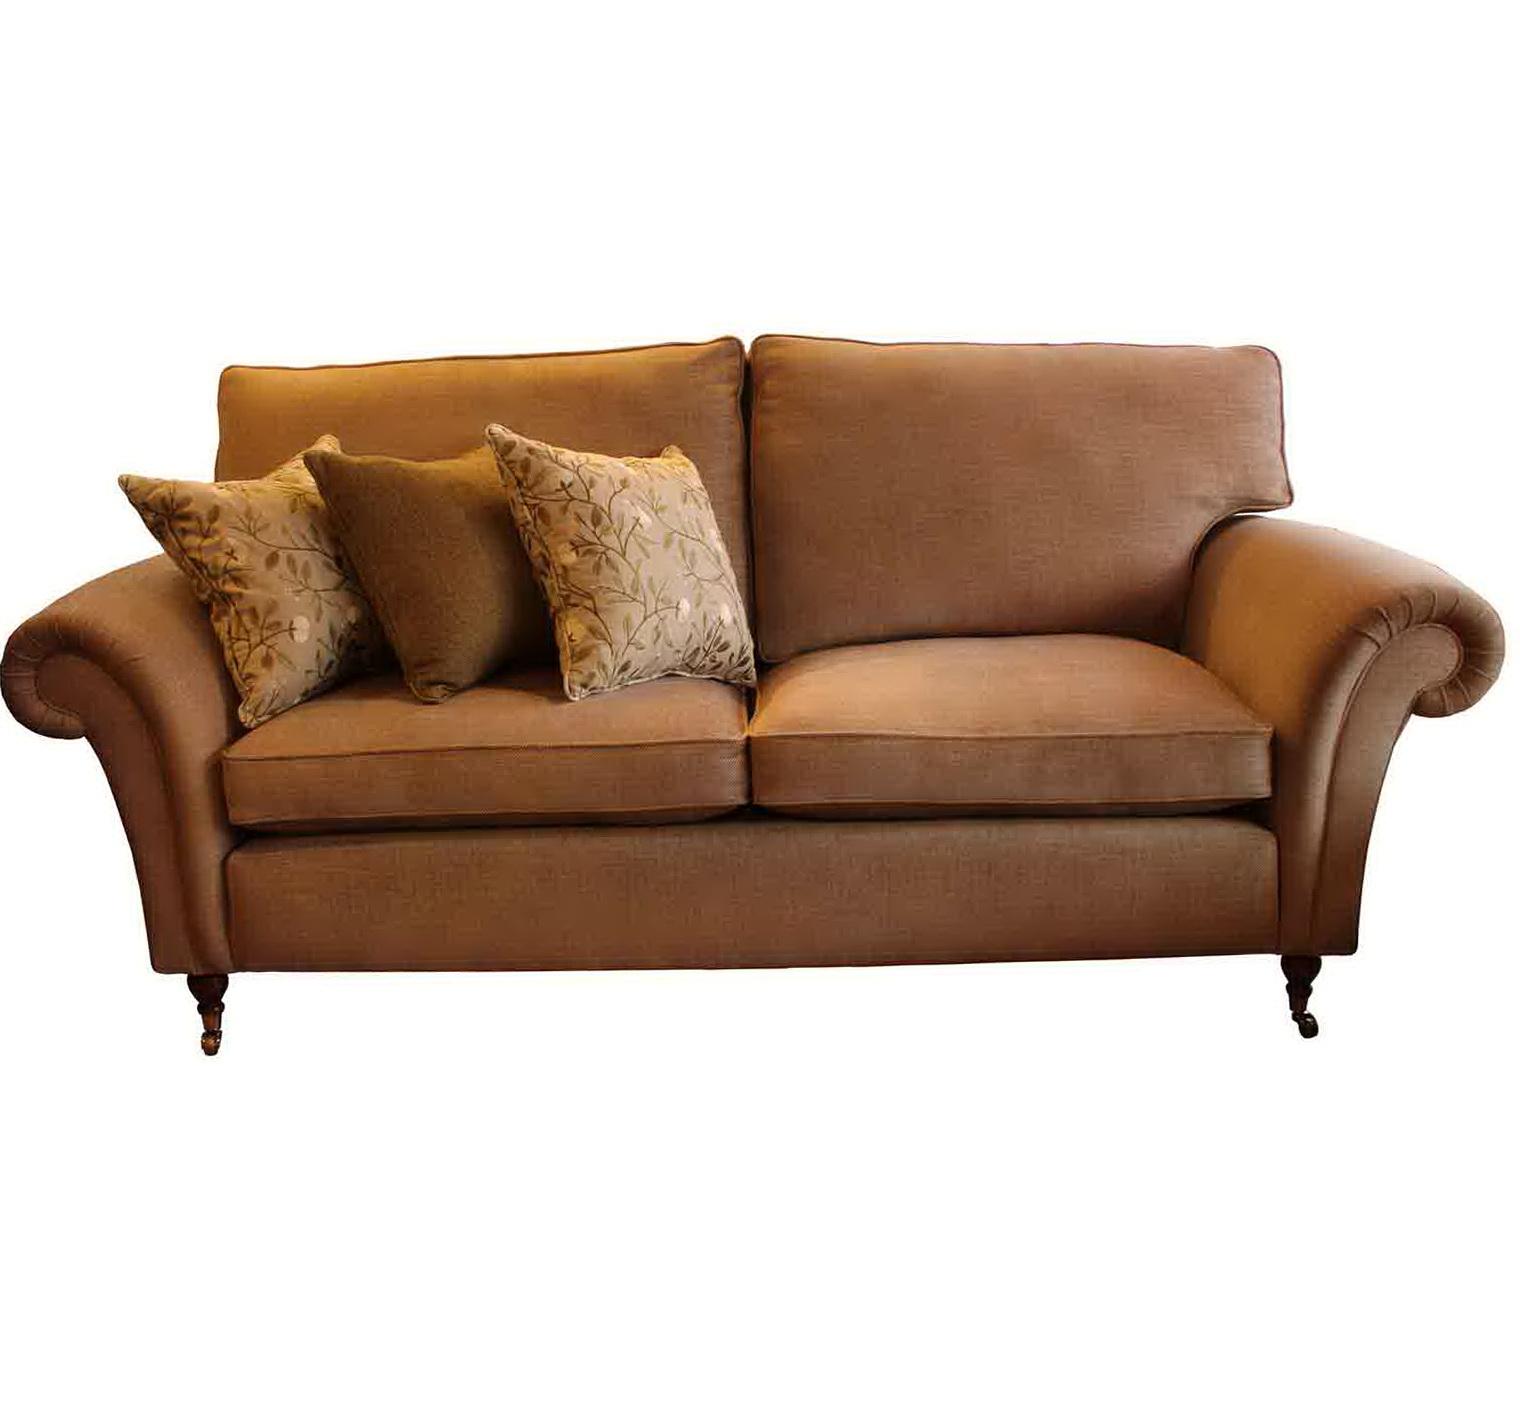 sofa pads uk siena corner leather effect bed with storage black custom cushions home design ideas